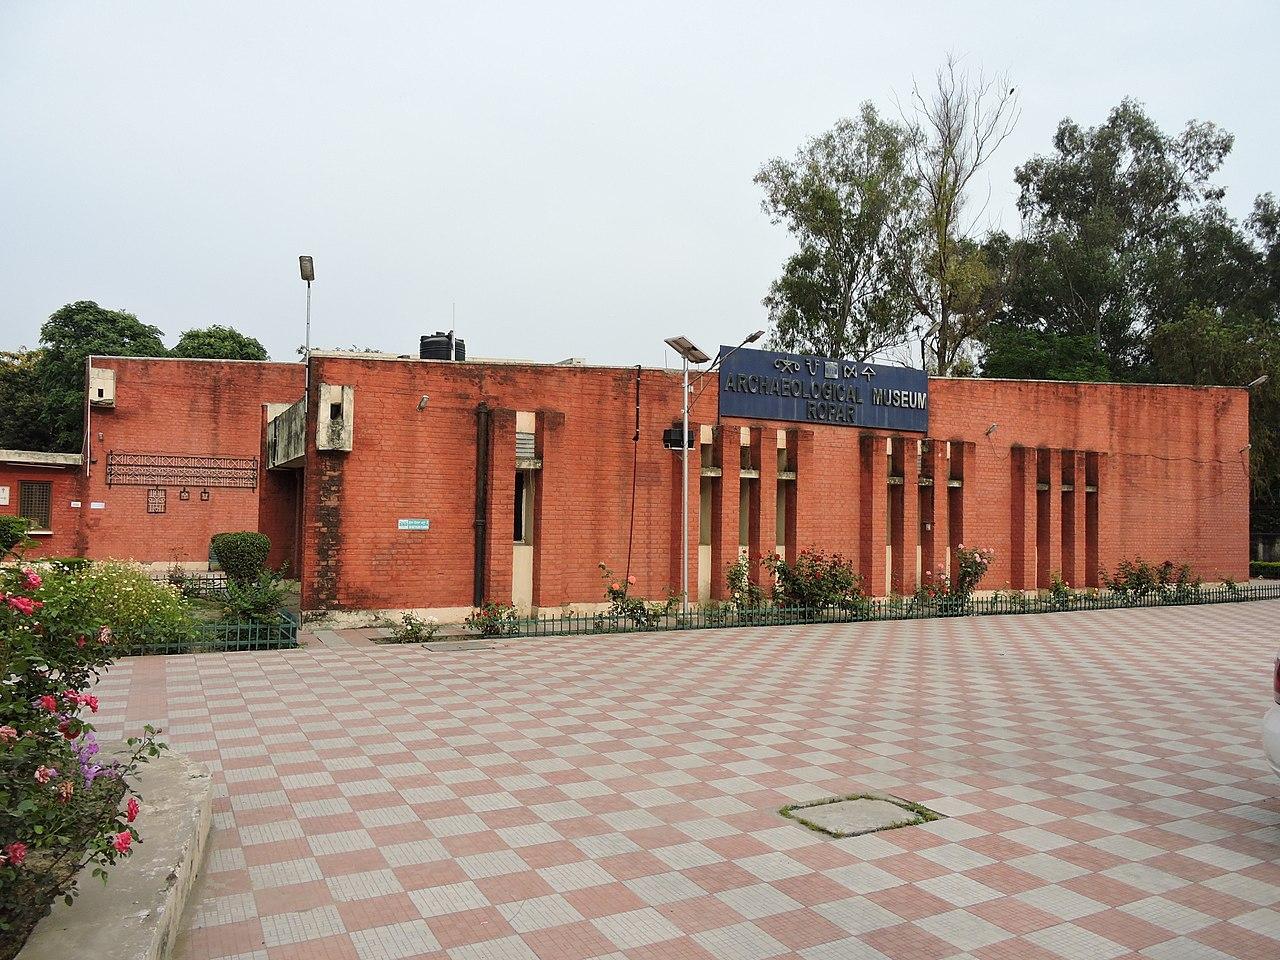 Sightseeing Destination in Rupnagar - Archaeological Museum